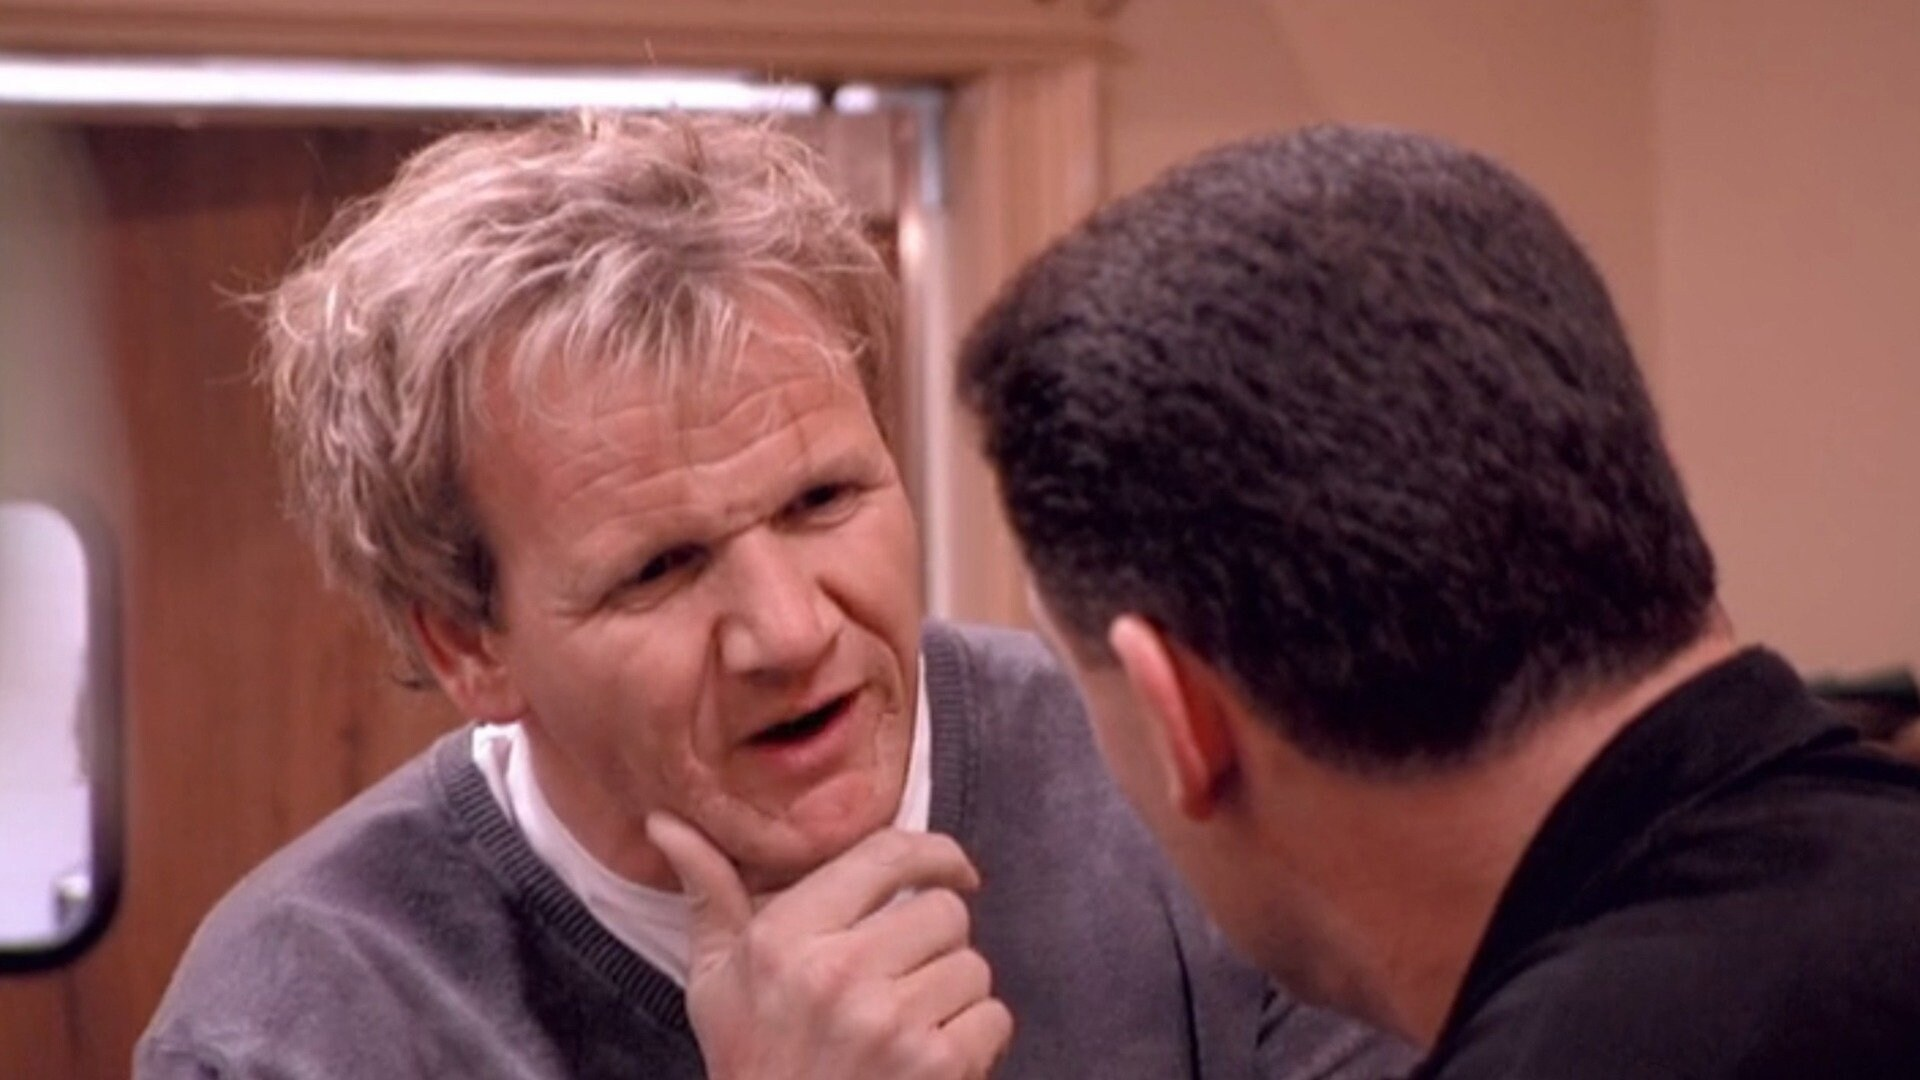 Episodes 11 and 12 - Revisited: Gordon Returns